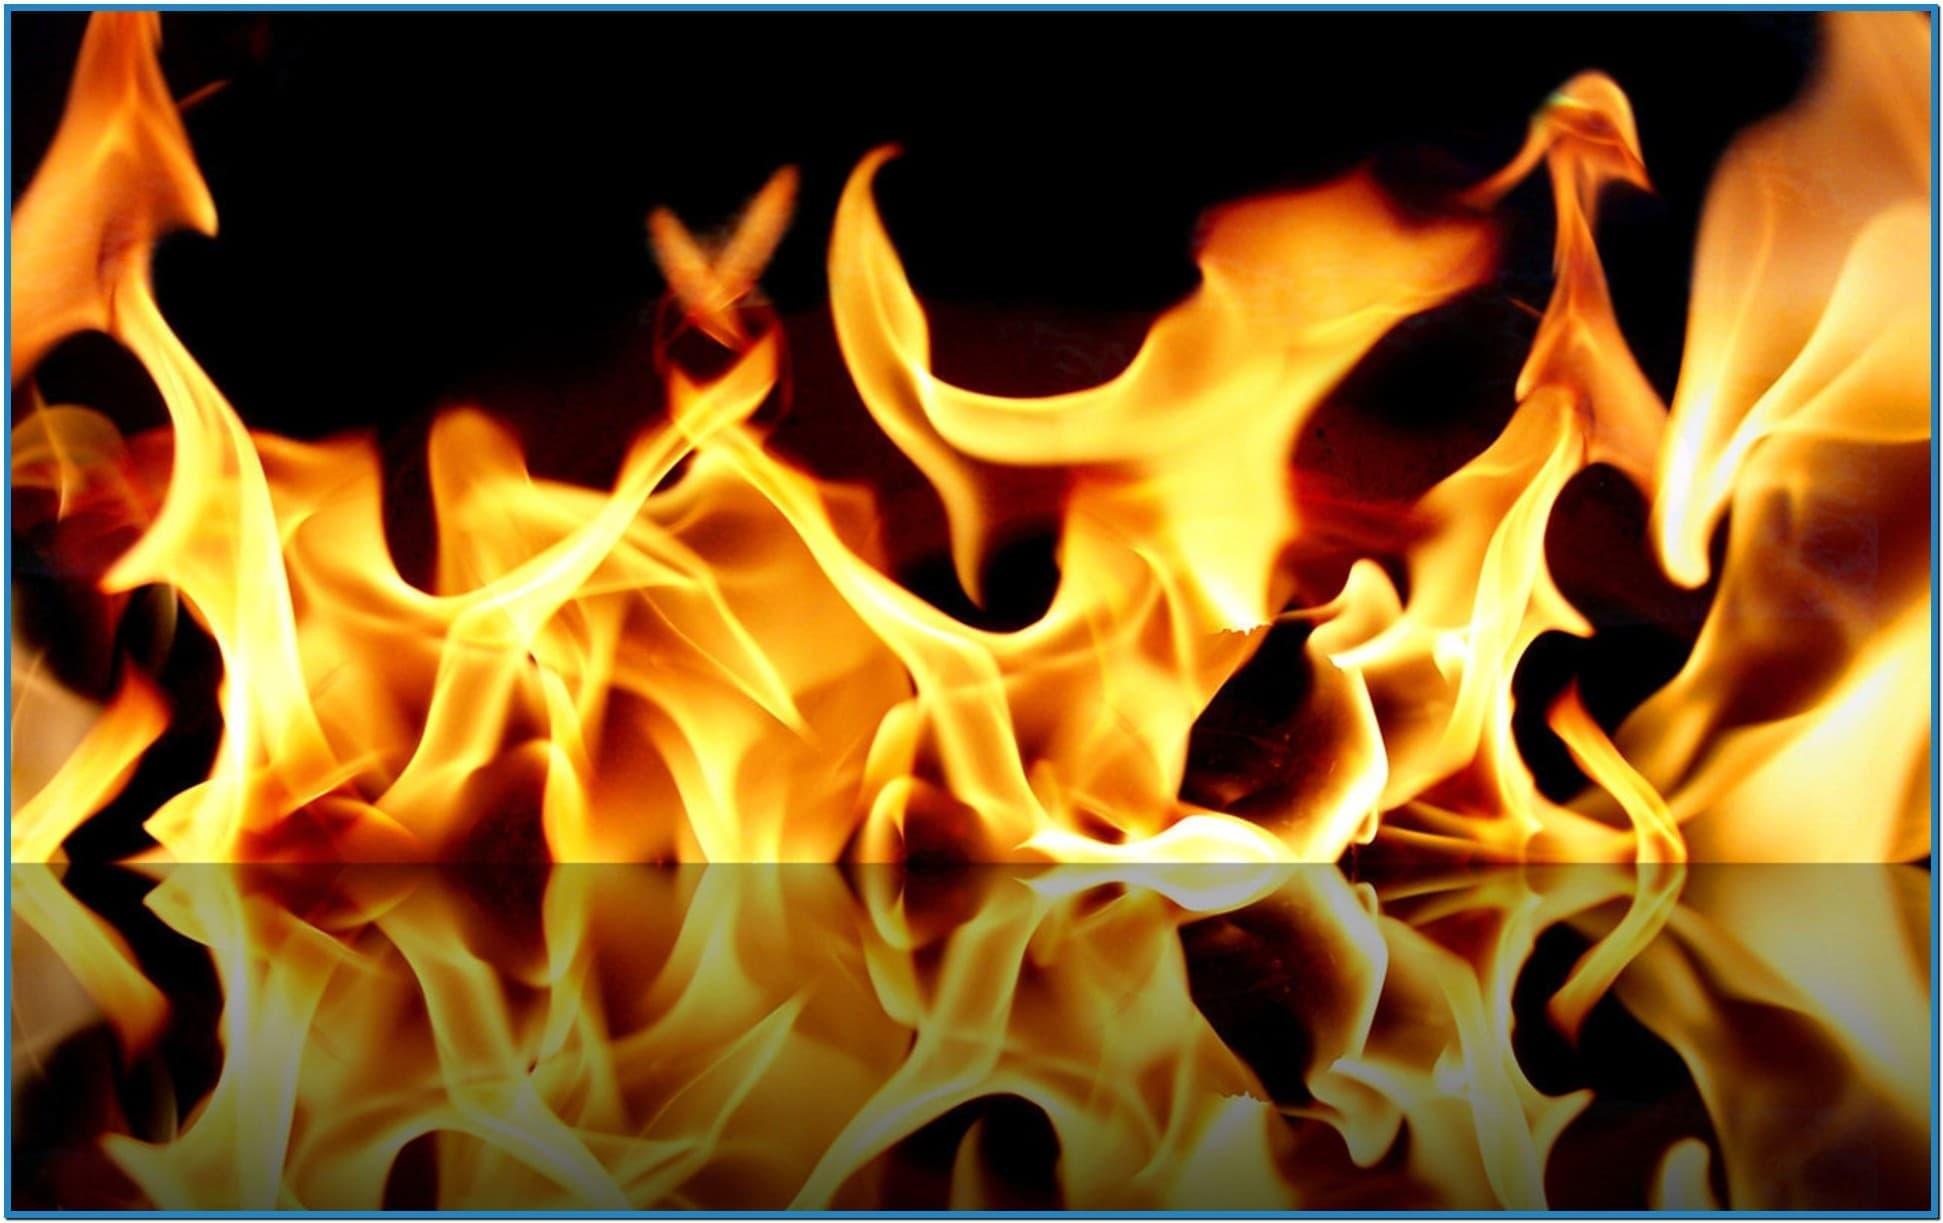 Fire screensaver hd   Download 1943x1223